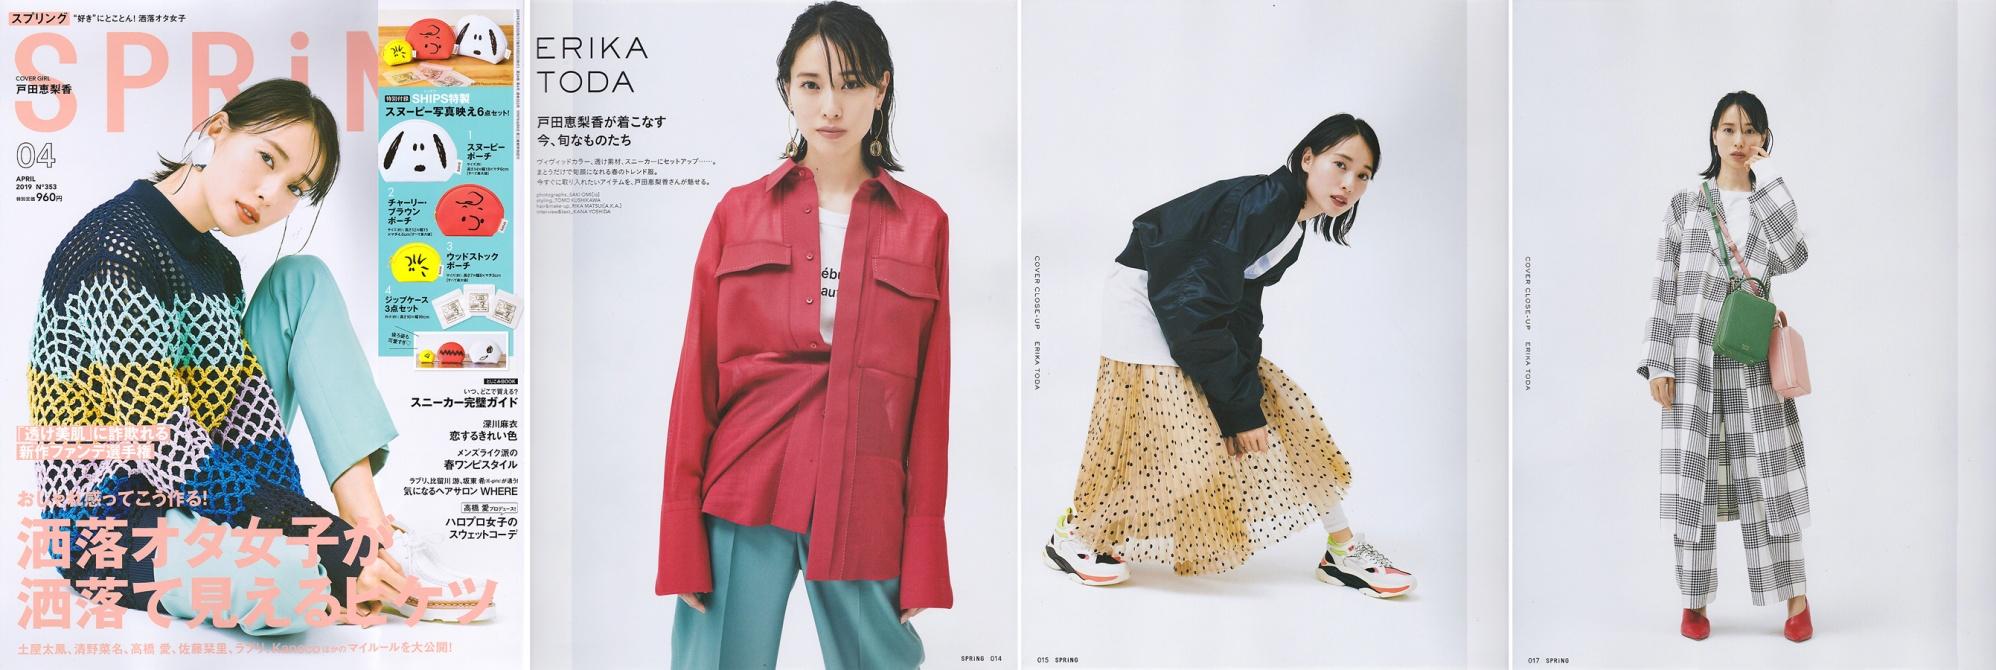 SPRiNG 2019 4月号 cover / Erika Toda